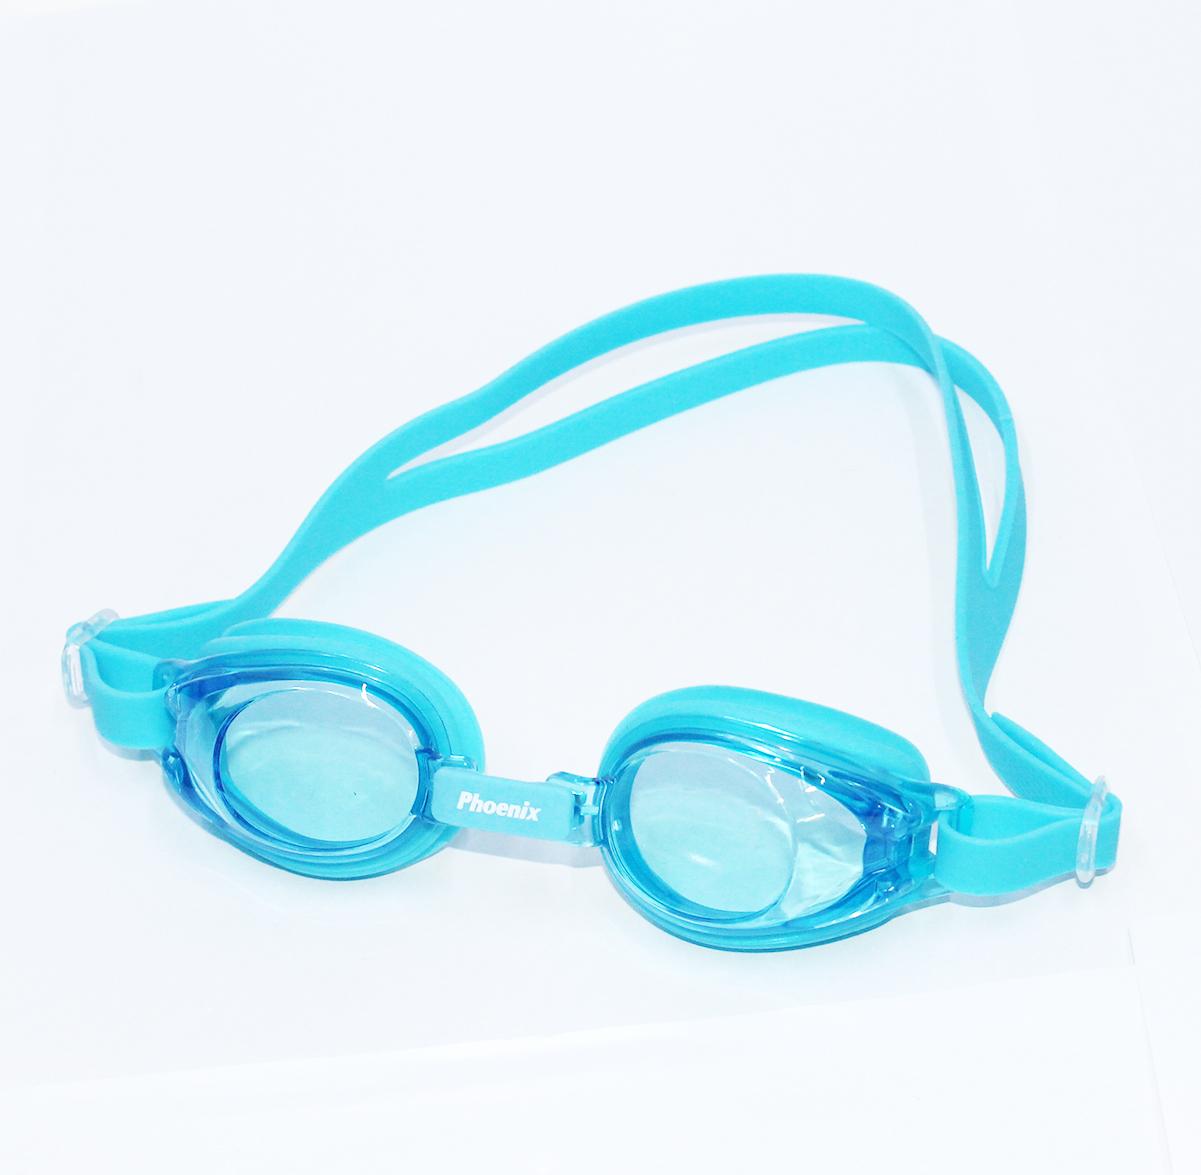 Kính bơi trẻ em PhoenixPN 506 màu xanh P506BL